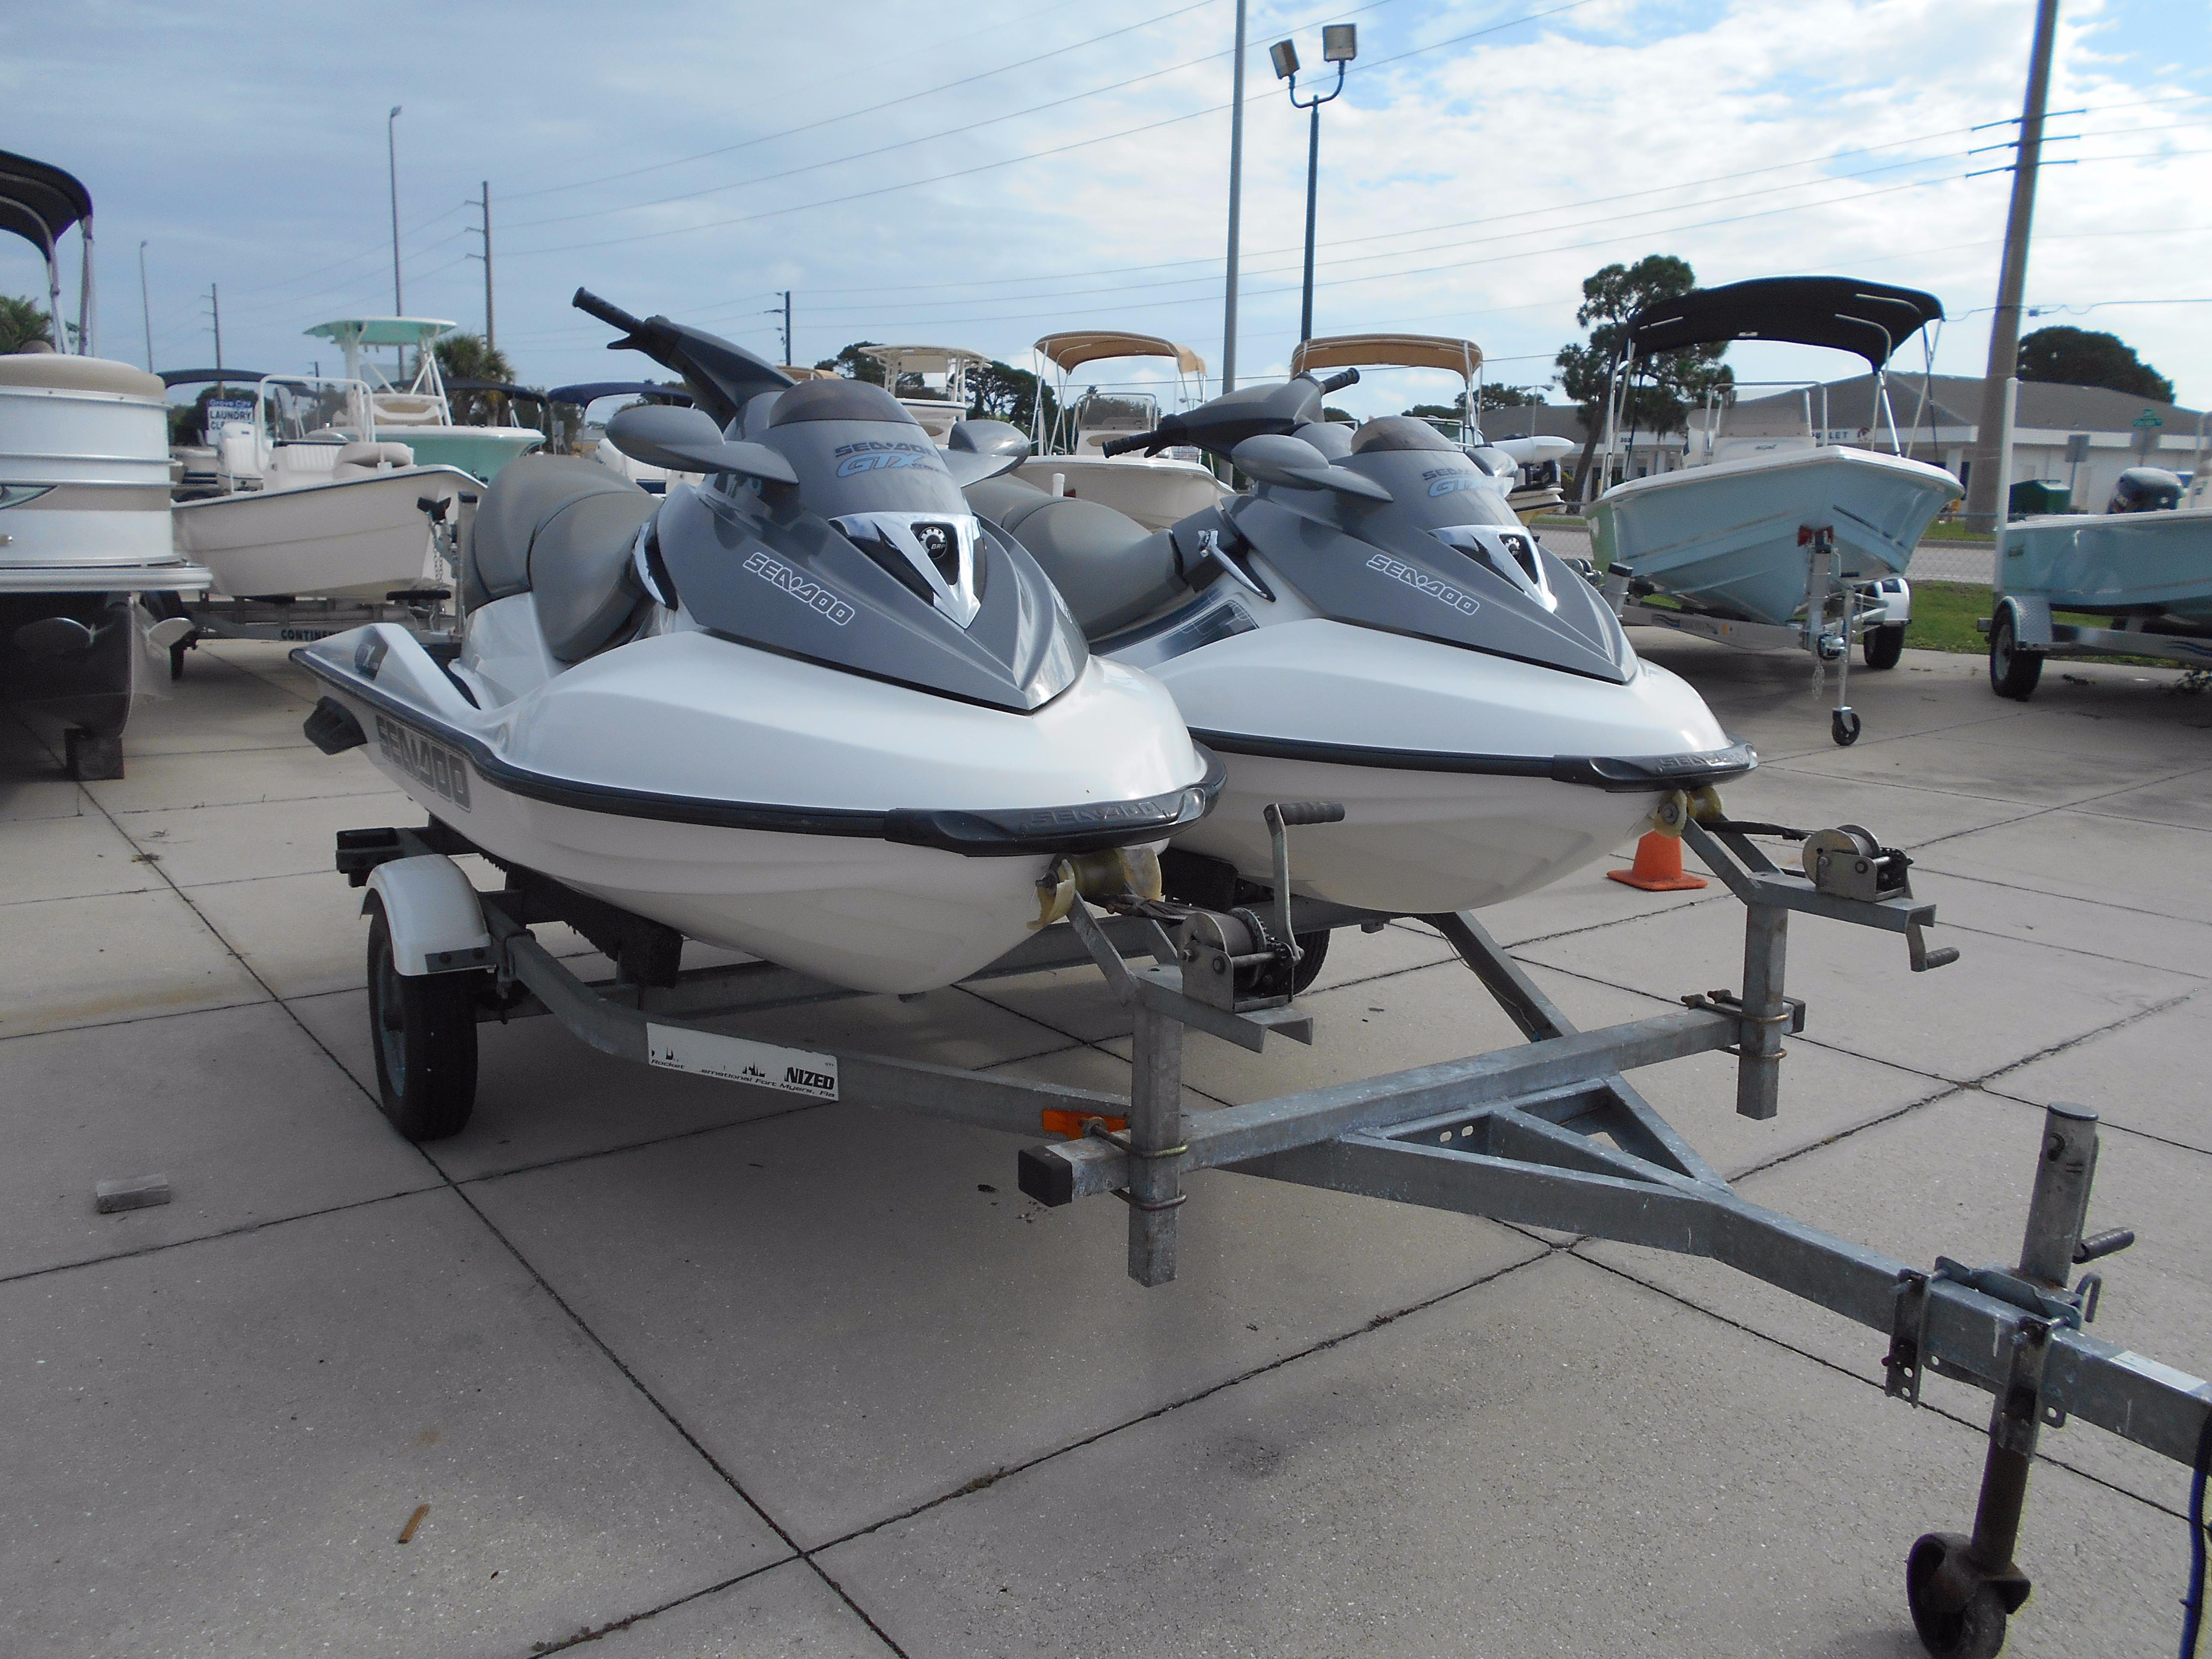 2006 Sea-doo Gtx 4-tec Power Boat For Sale